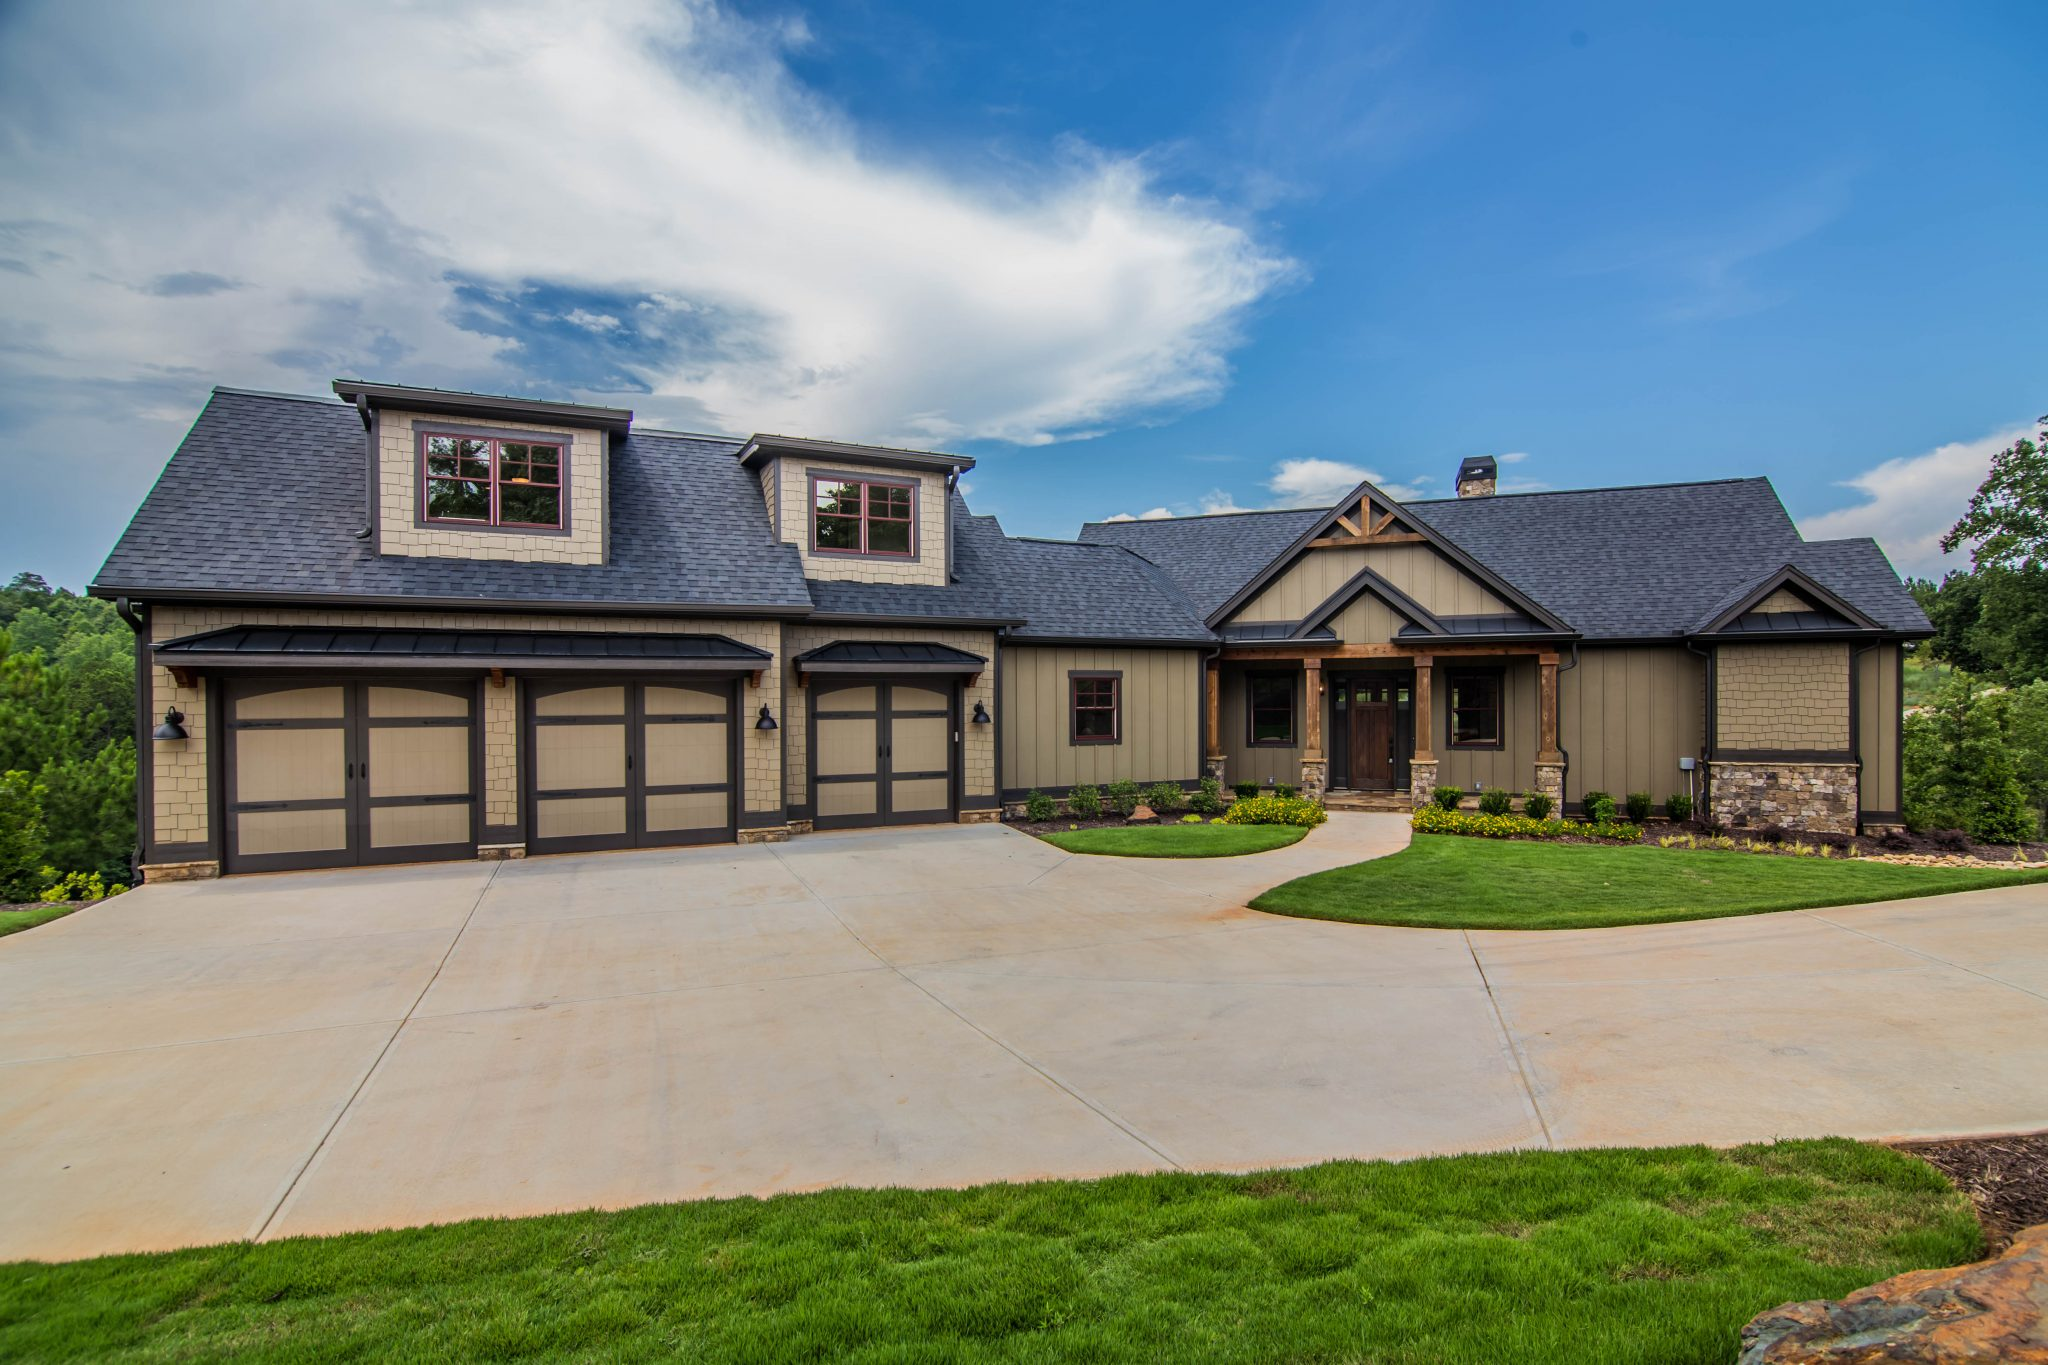 243 Edgewater Trail Currahee Home Builder S Toccoa-GA